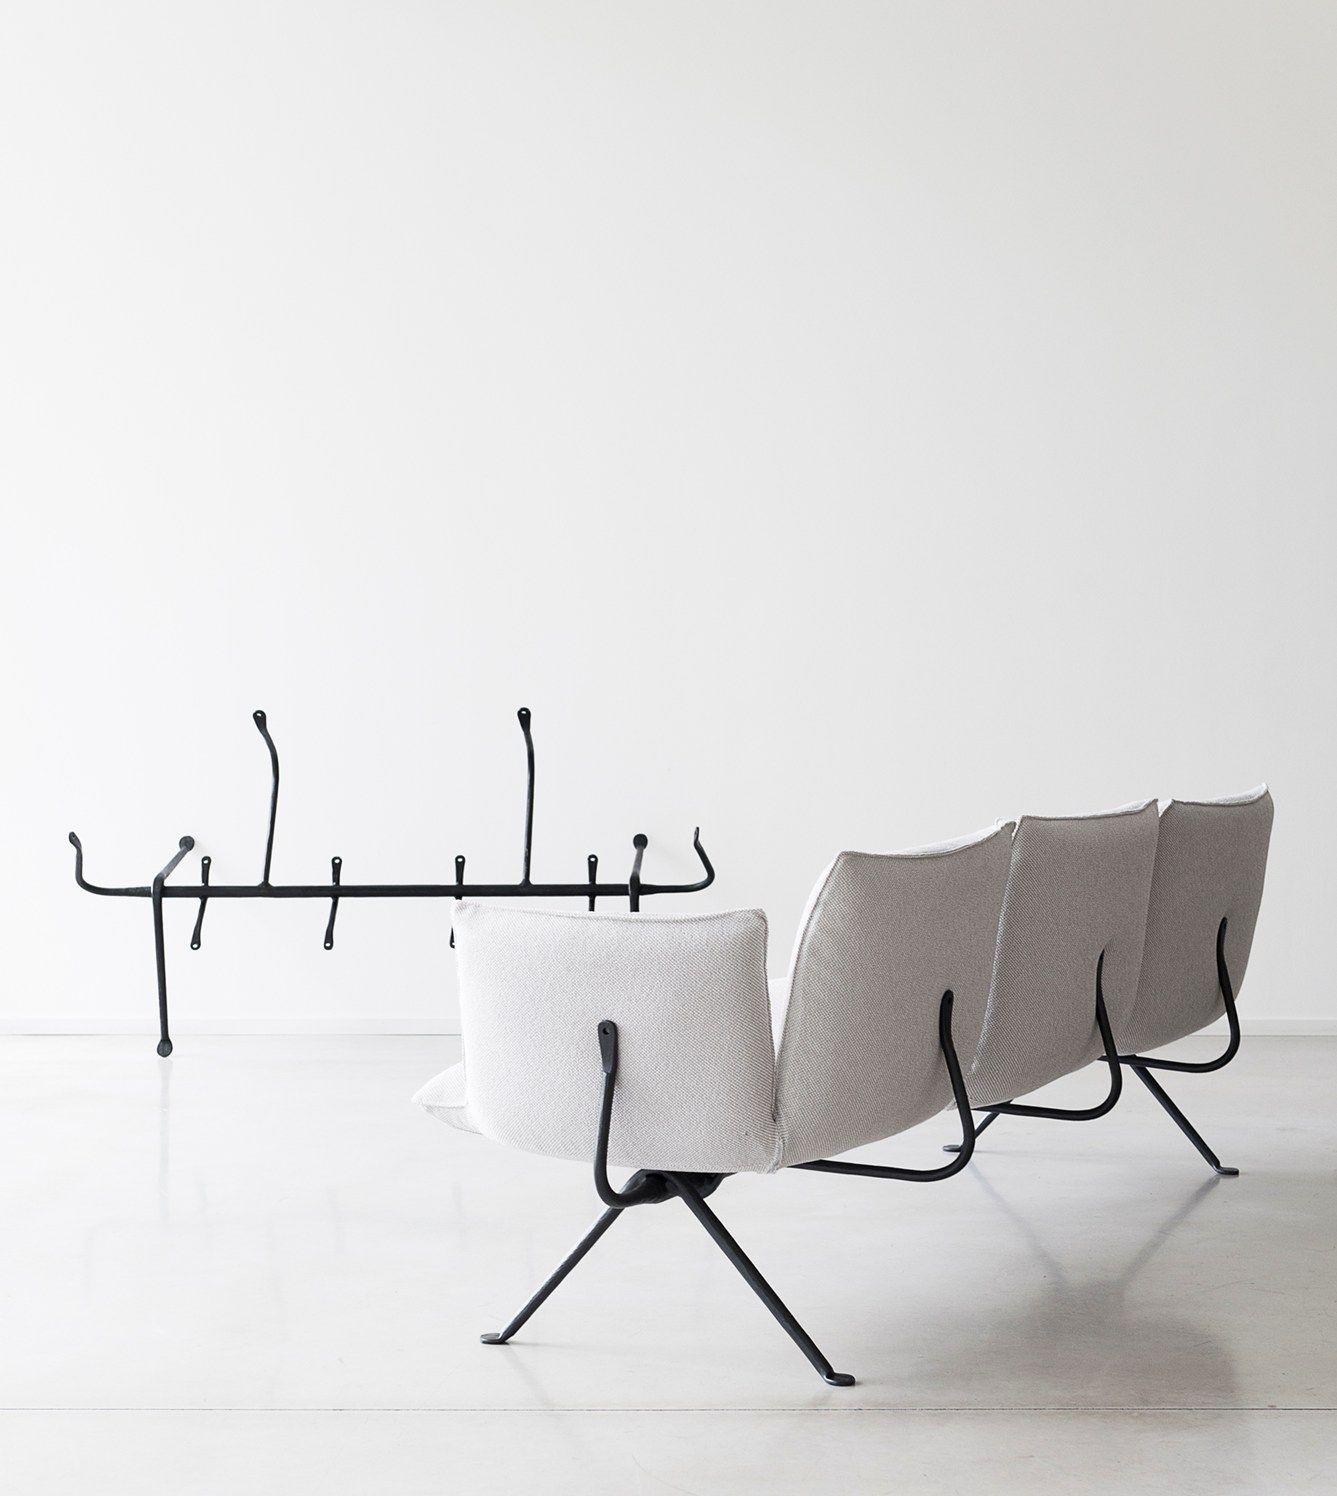 ferro forgiato e ghisa industriale officina e brut. Black Bedroom Furniture Sets. Home Design Ideas